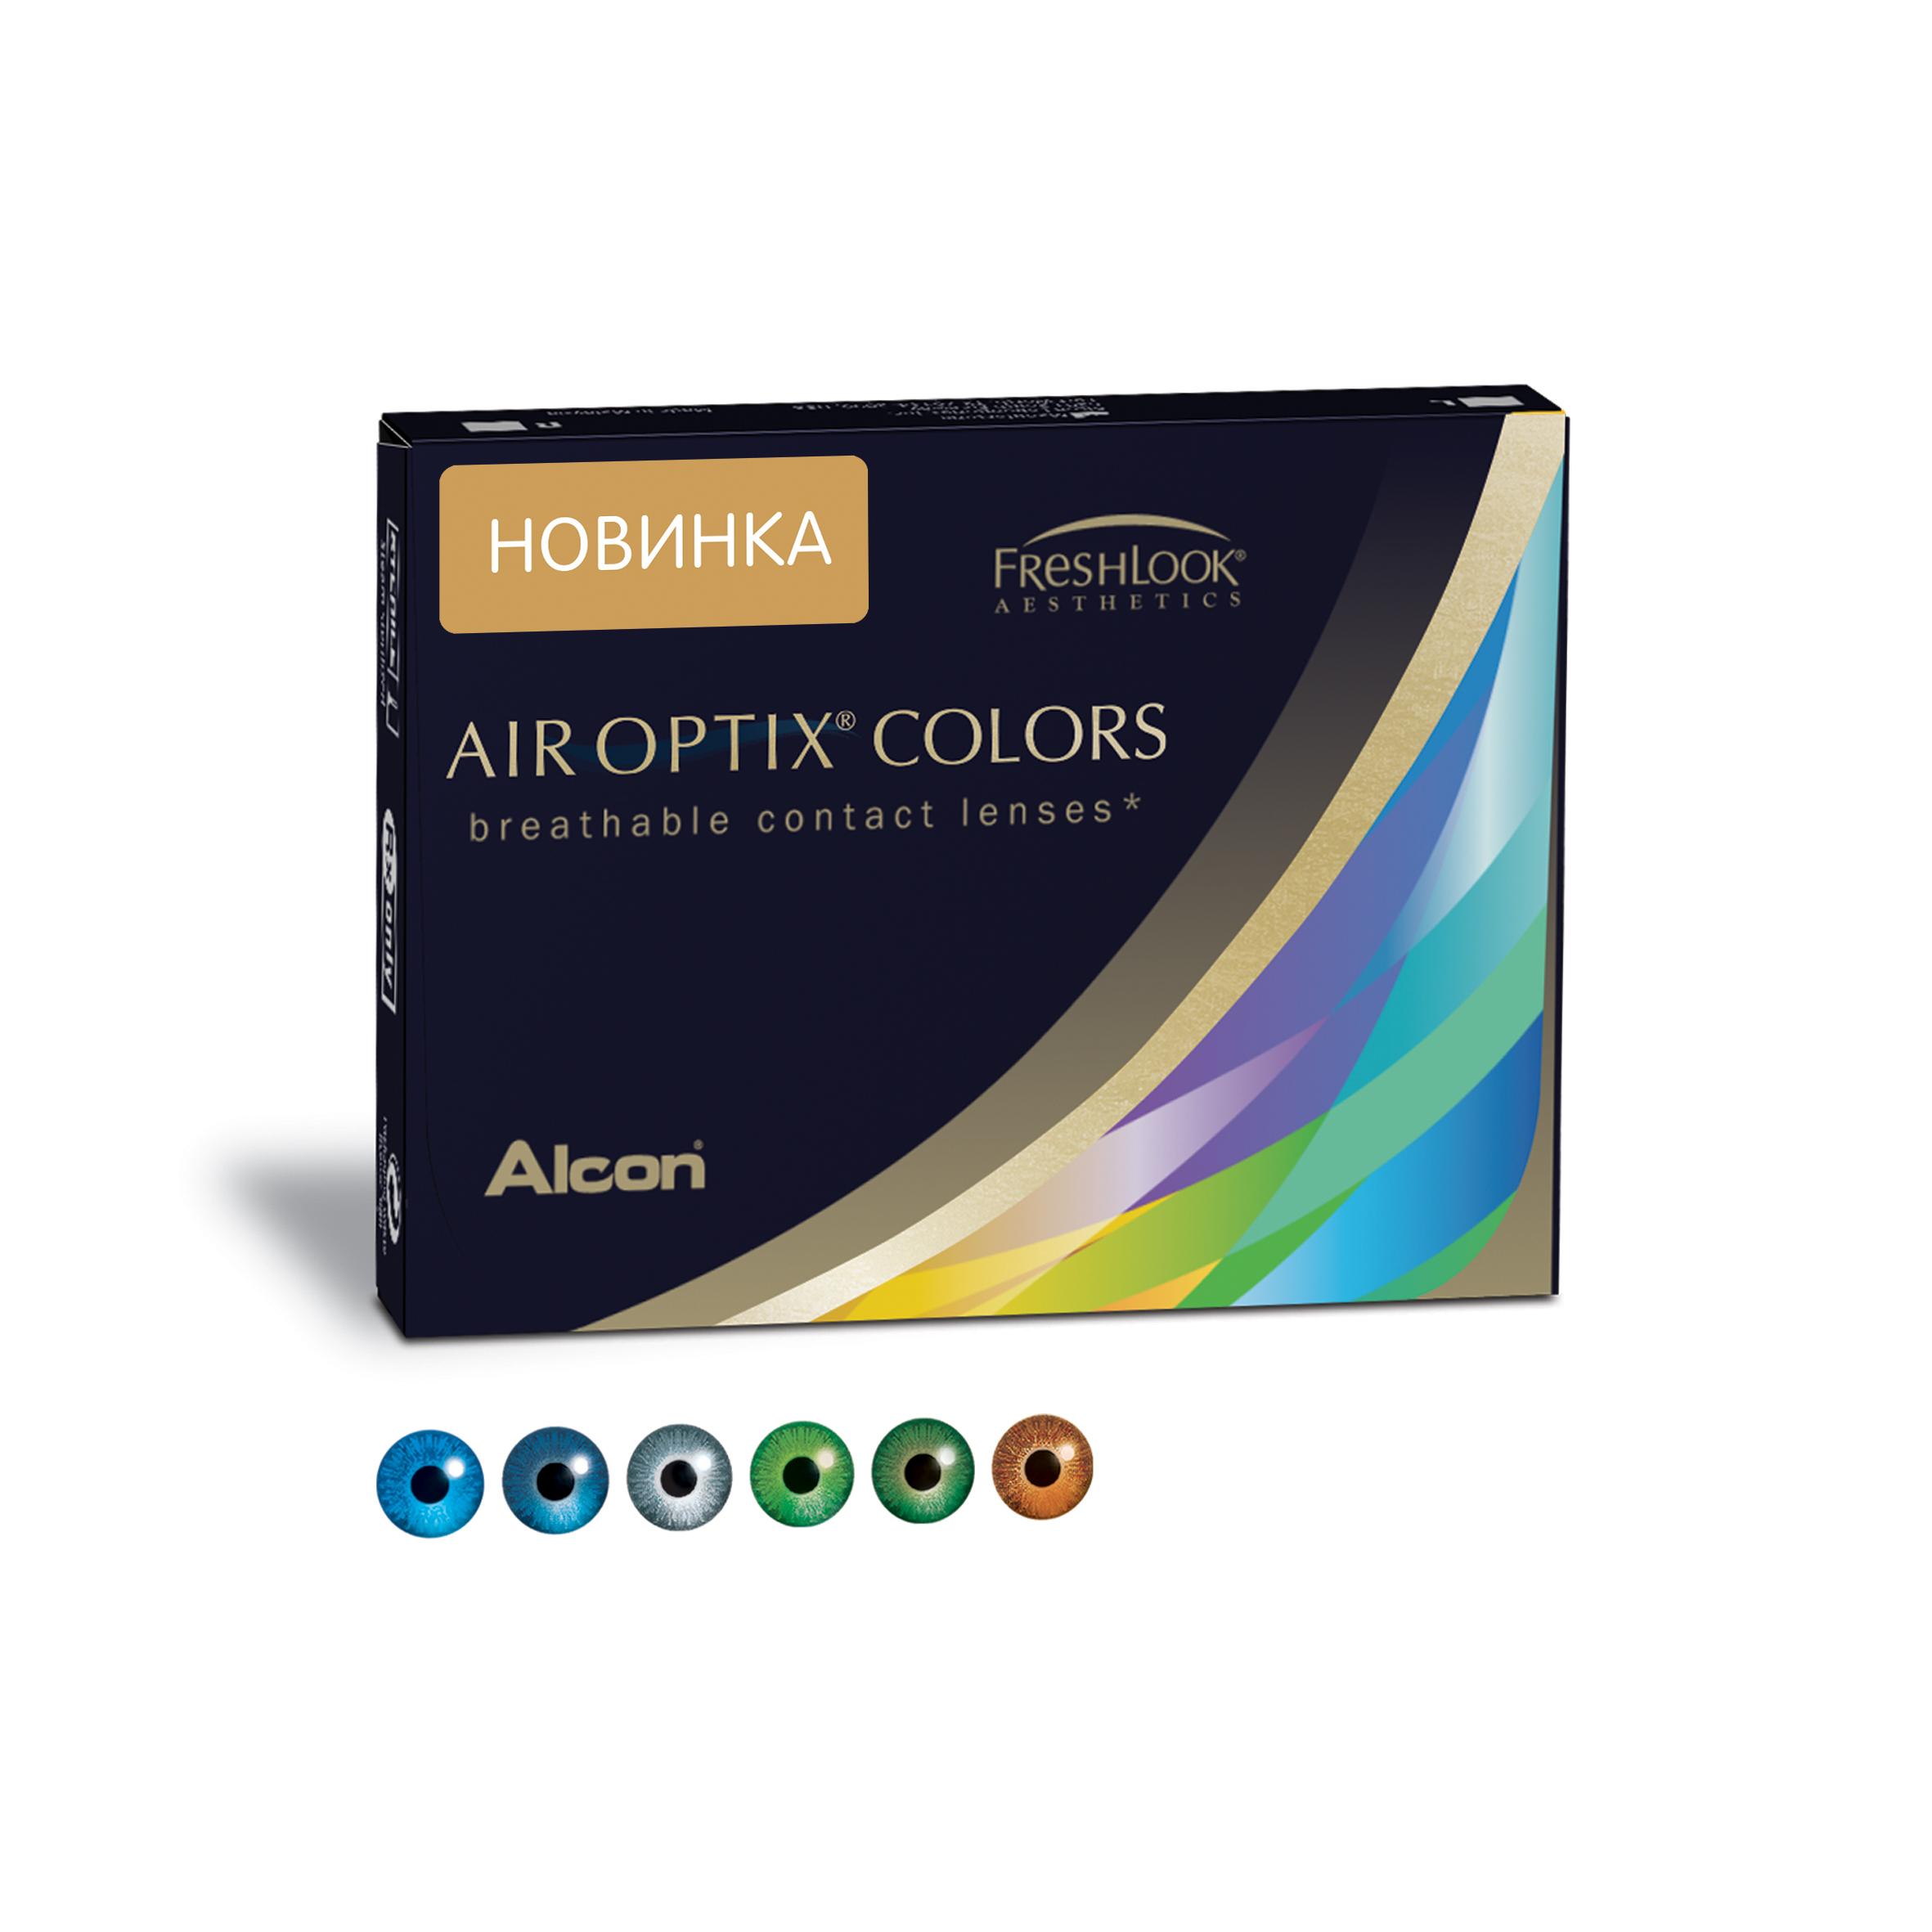 Аlcon контактные линзы Air Optix Colors 2 шт -1.25 Blue31746130Мягкие контактные линзы